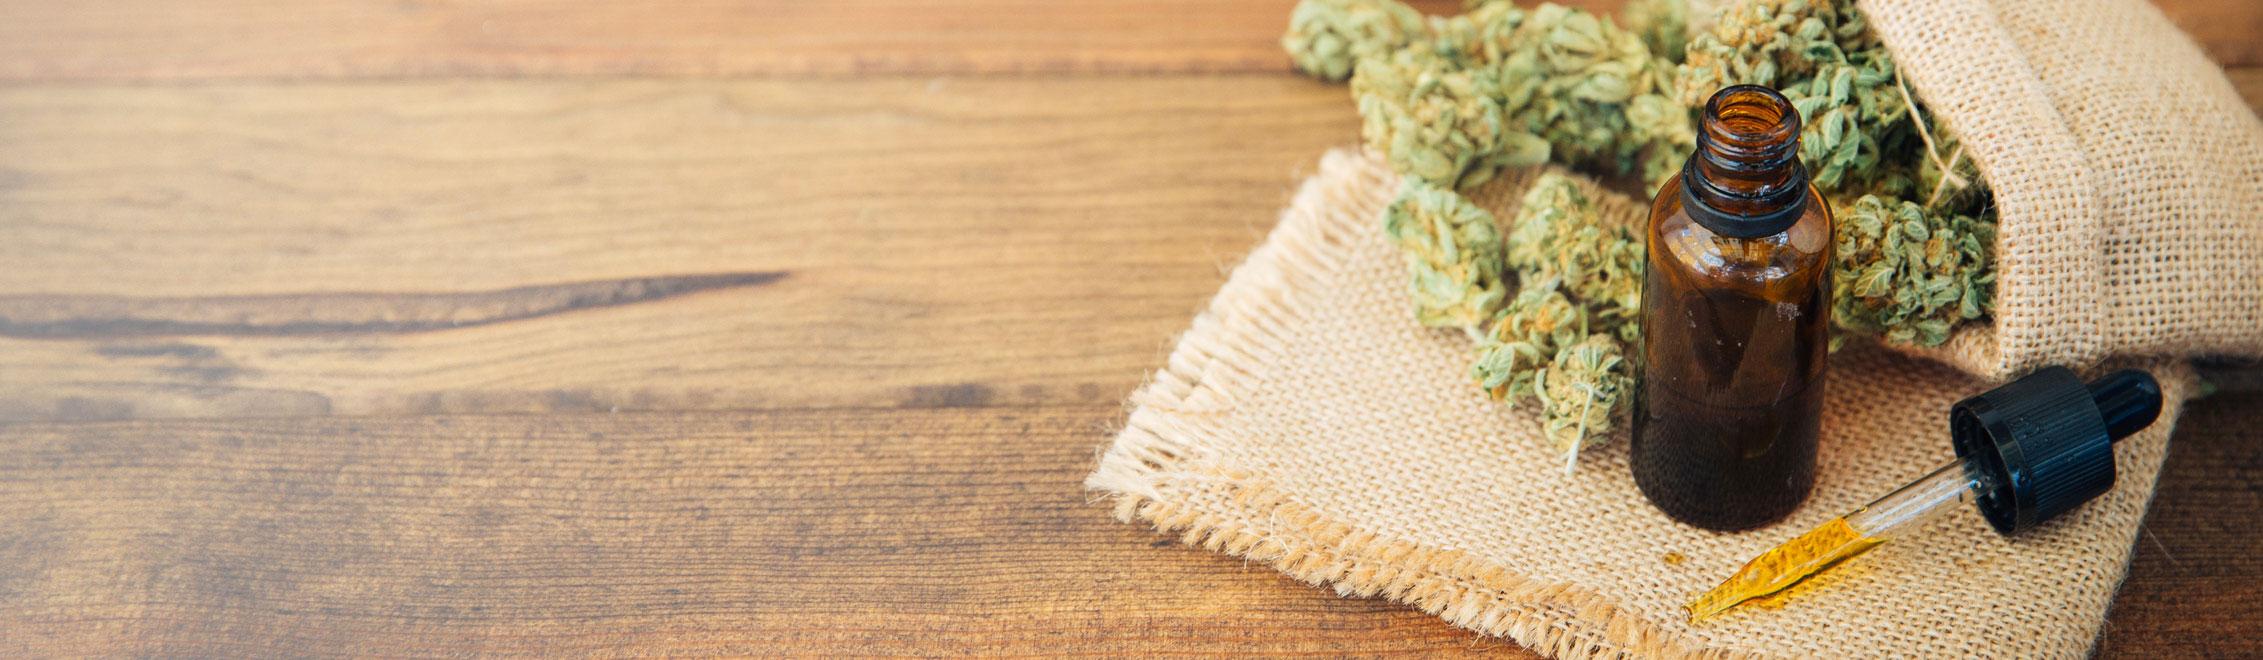 Image on About page medical marijuana CBD Oil on wood table